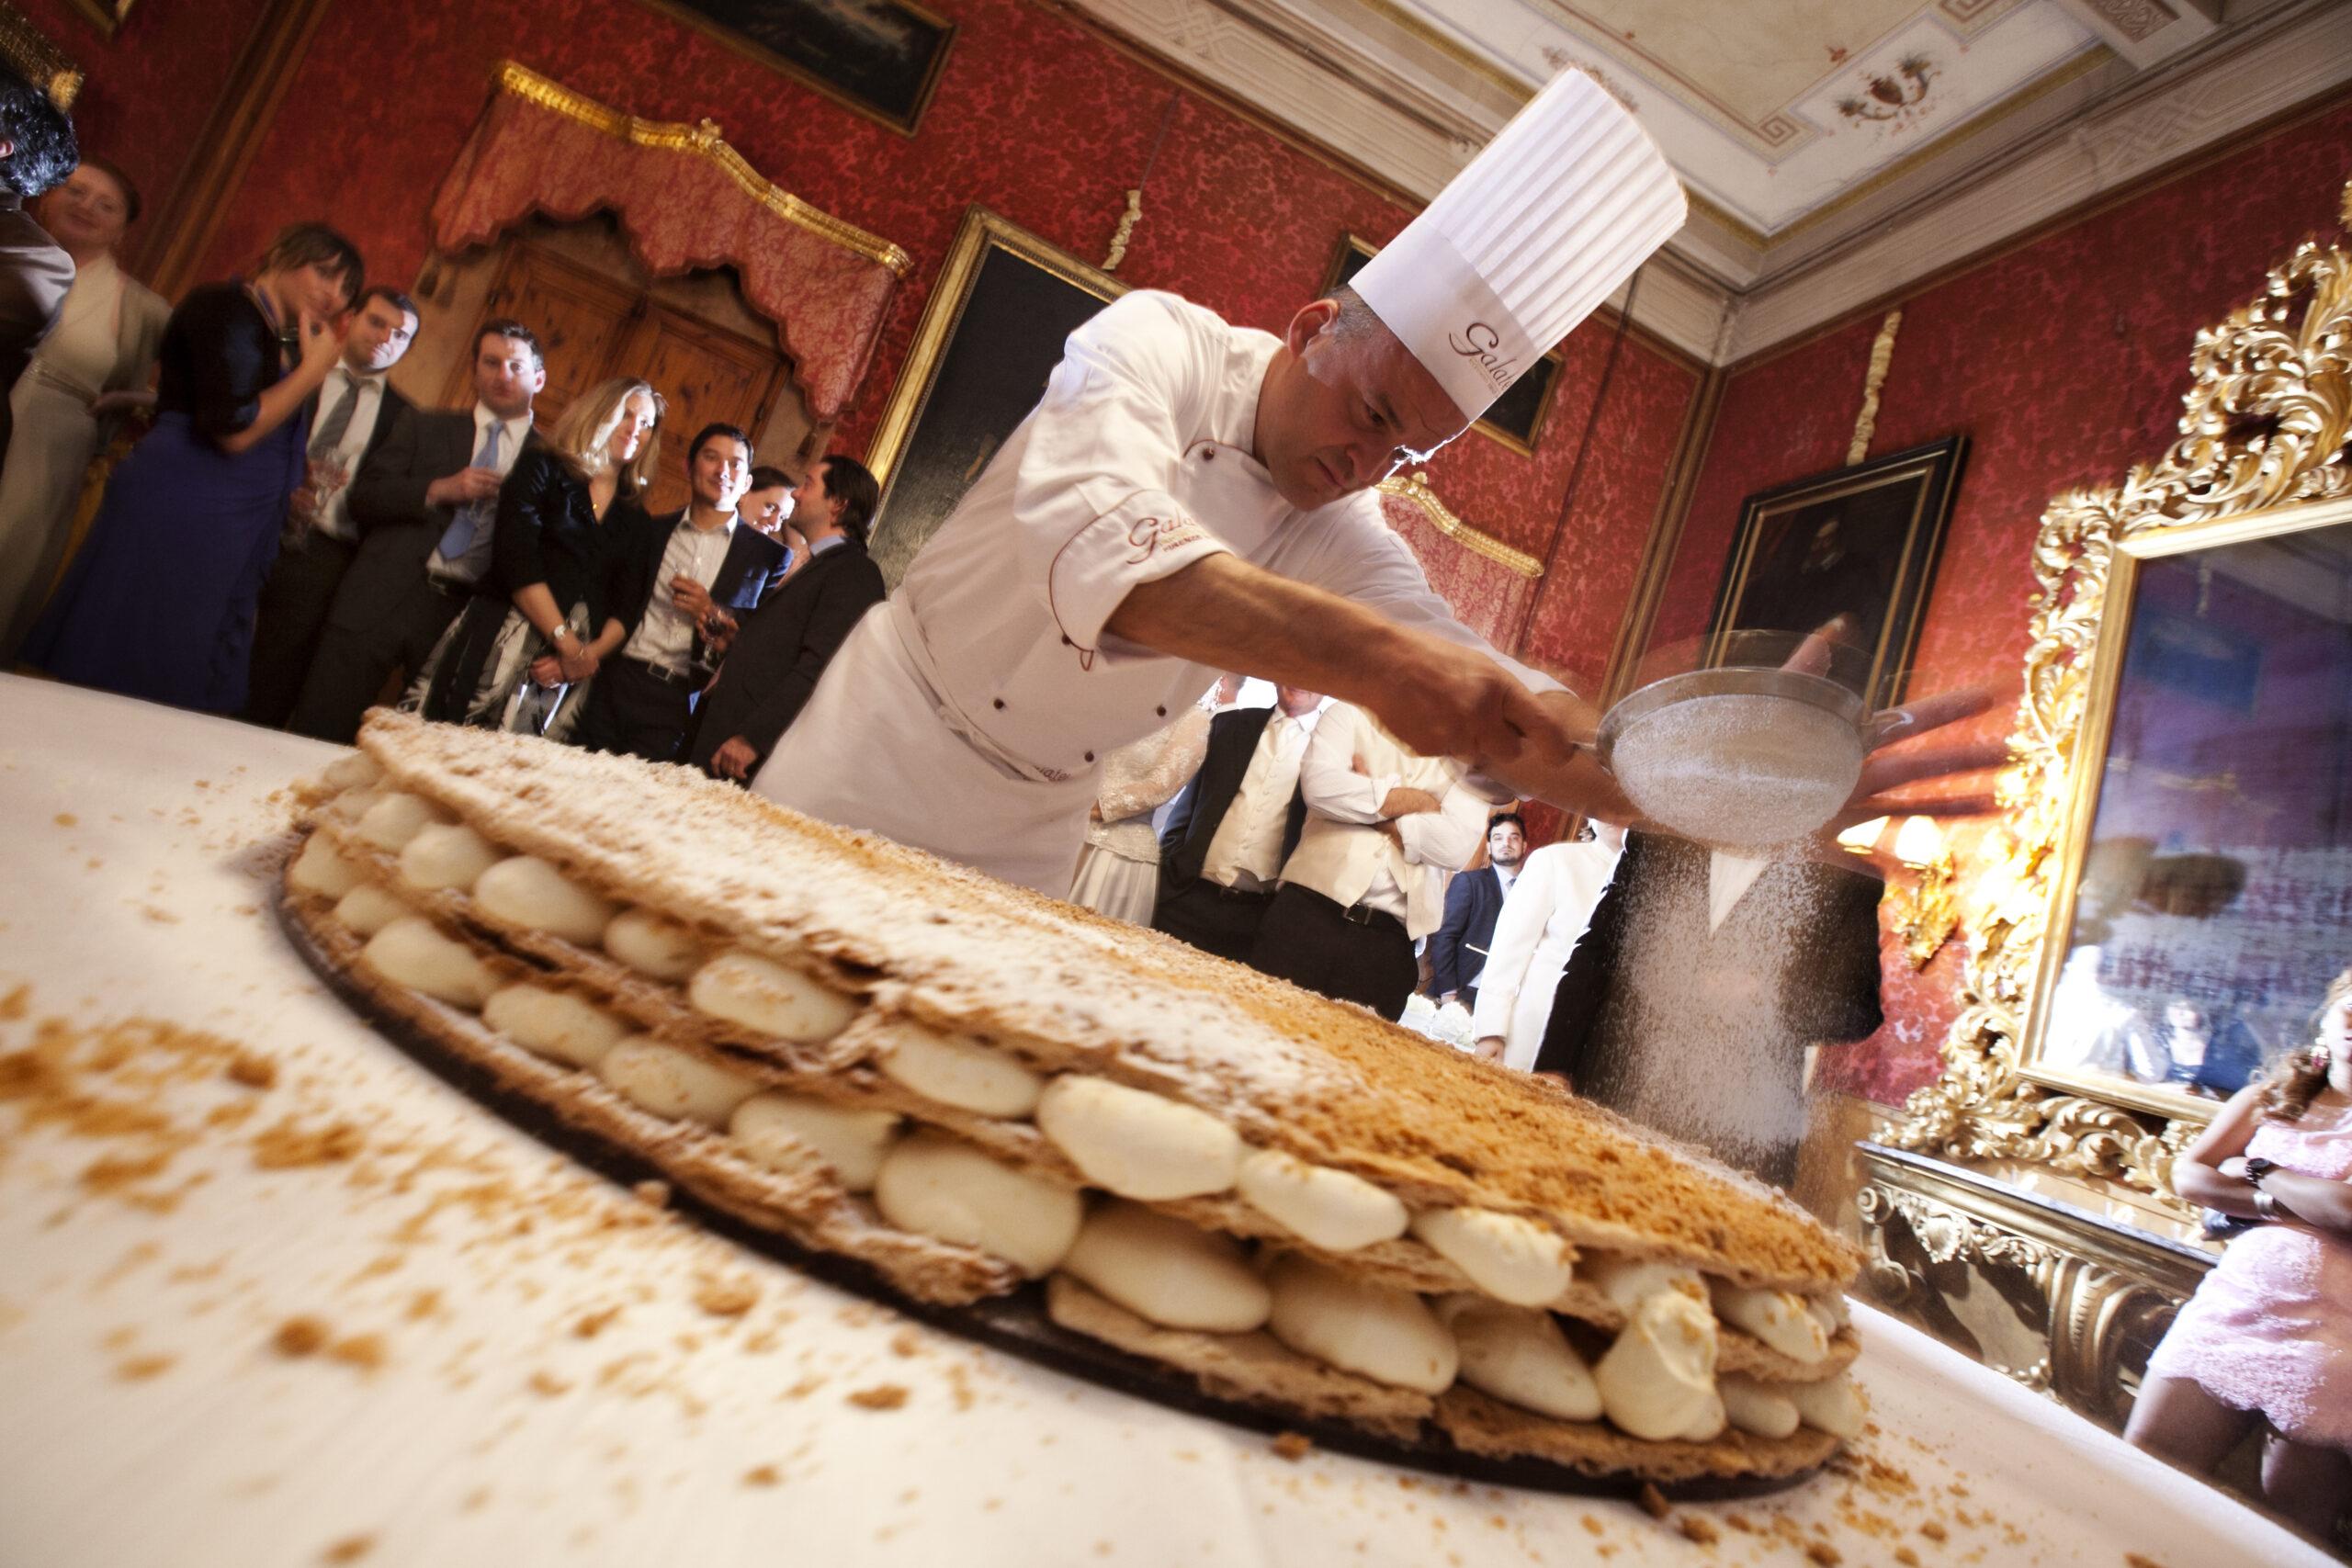 Preparing mille foglie cake on sight